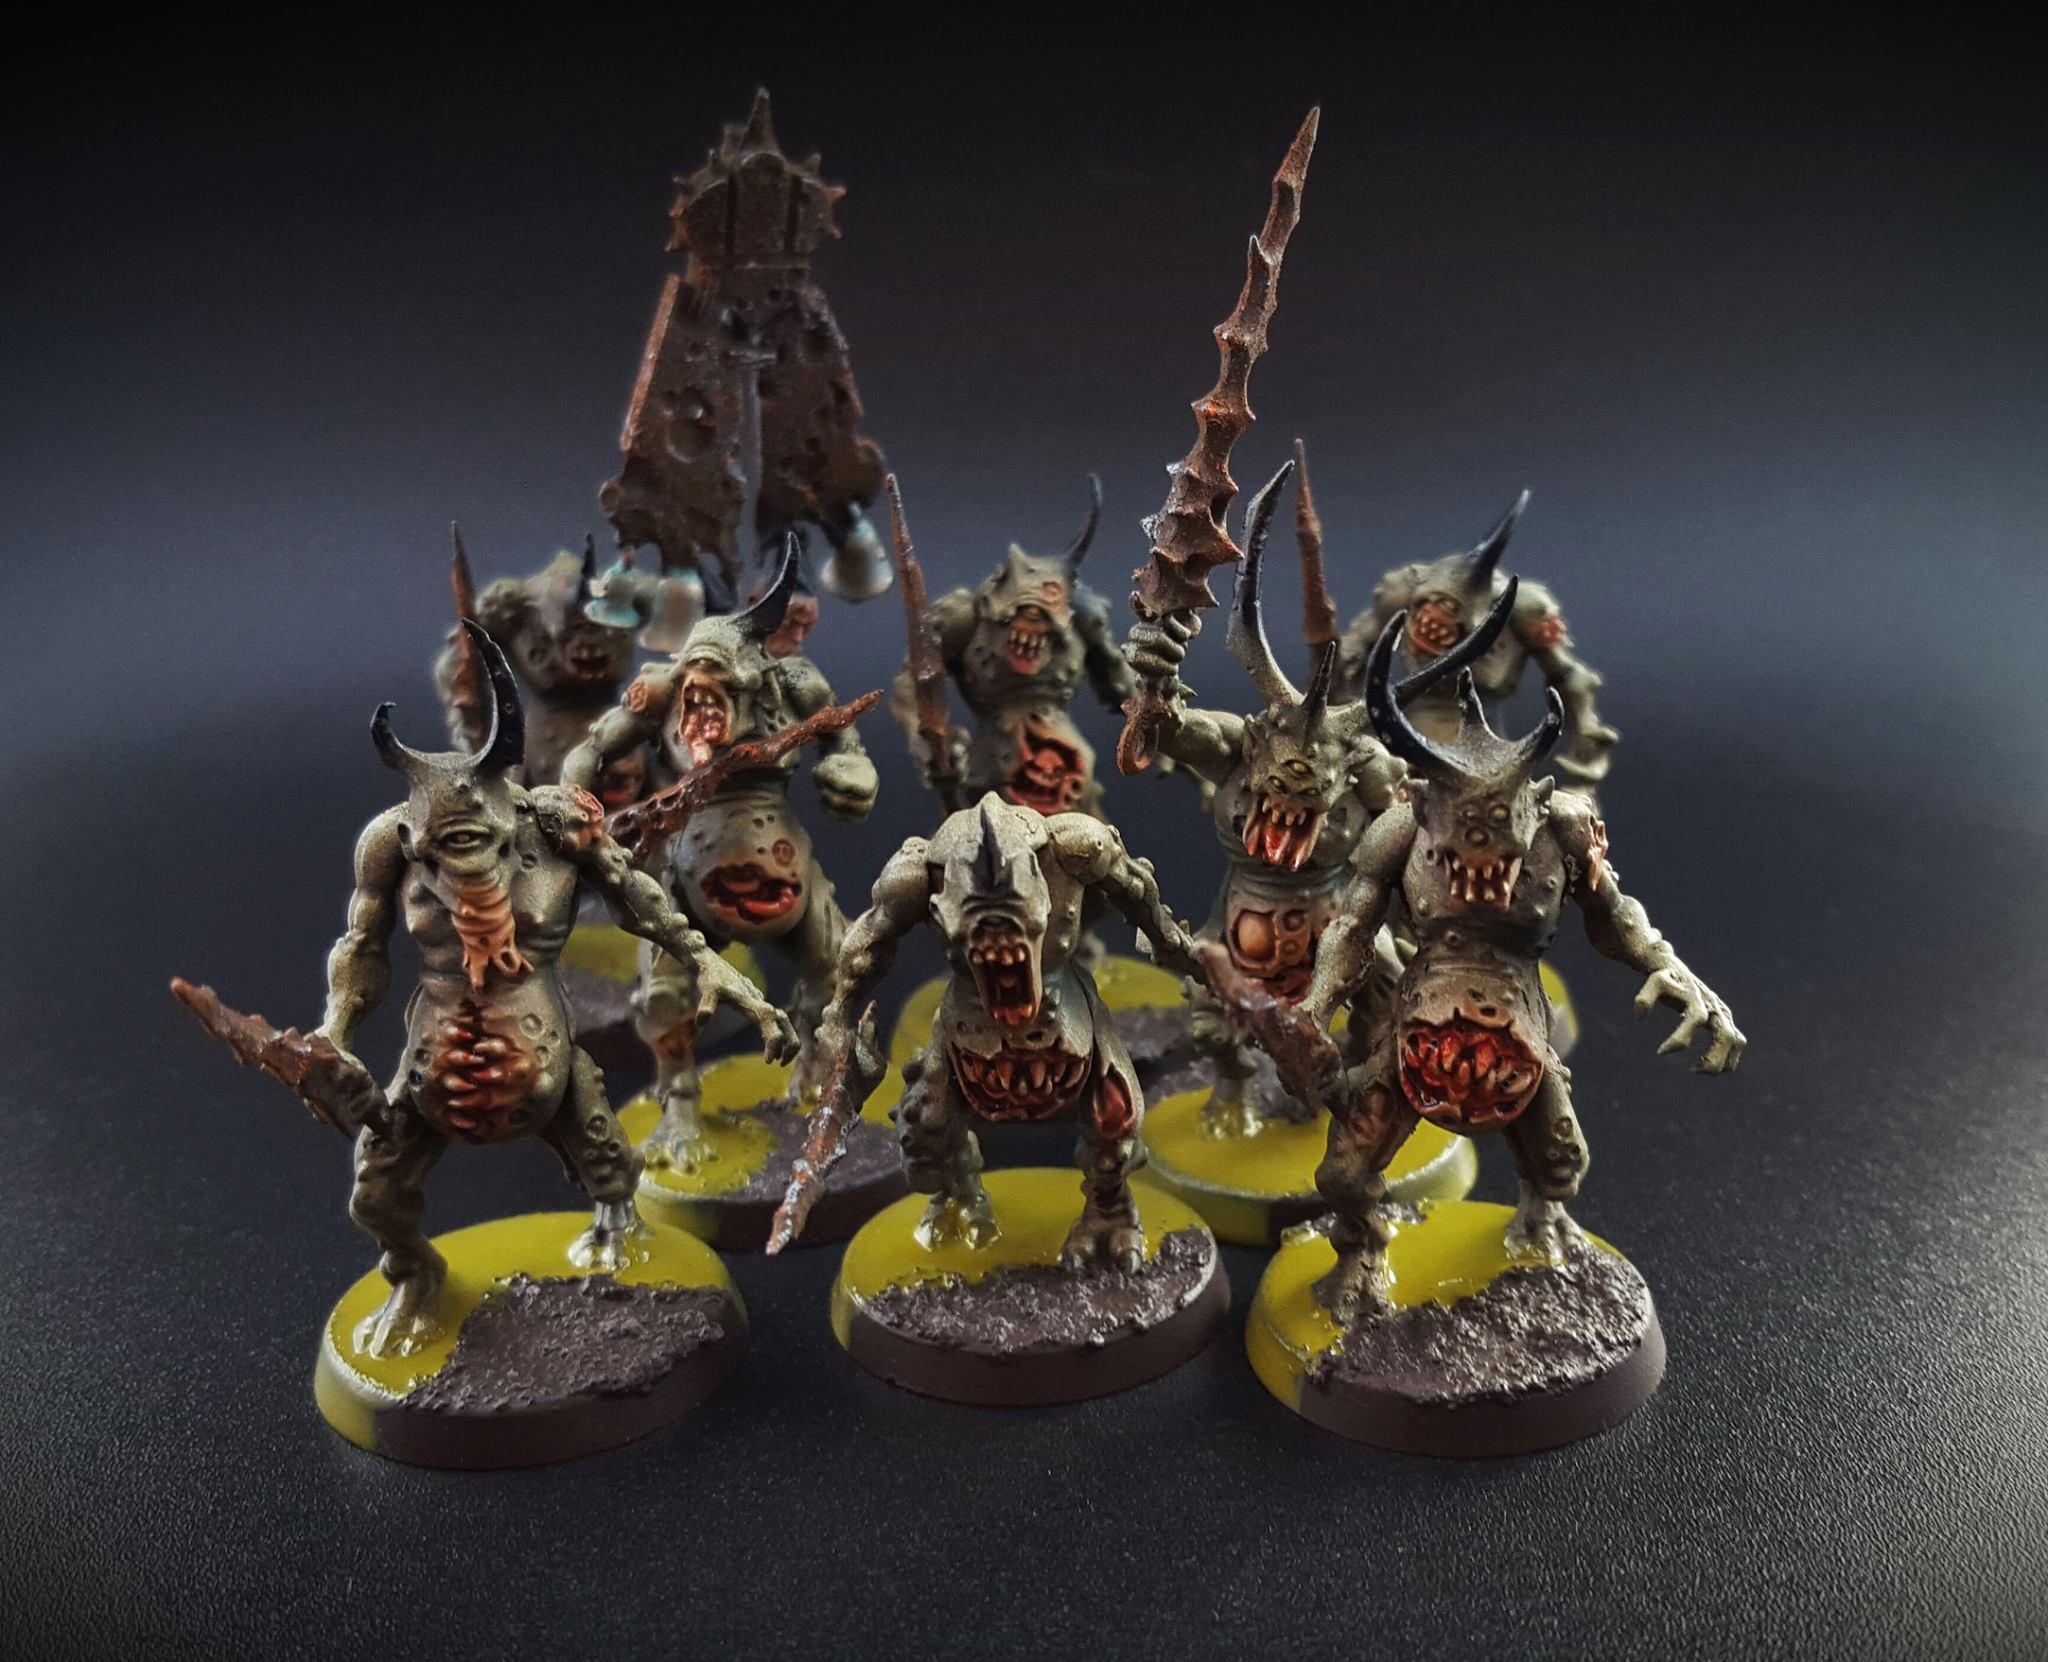 Chaos, Chaos Undivided, Daemons, Khorne, Nurgle, Slaanesh, Tzeentch, Warhammer 40,000